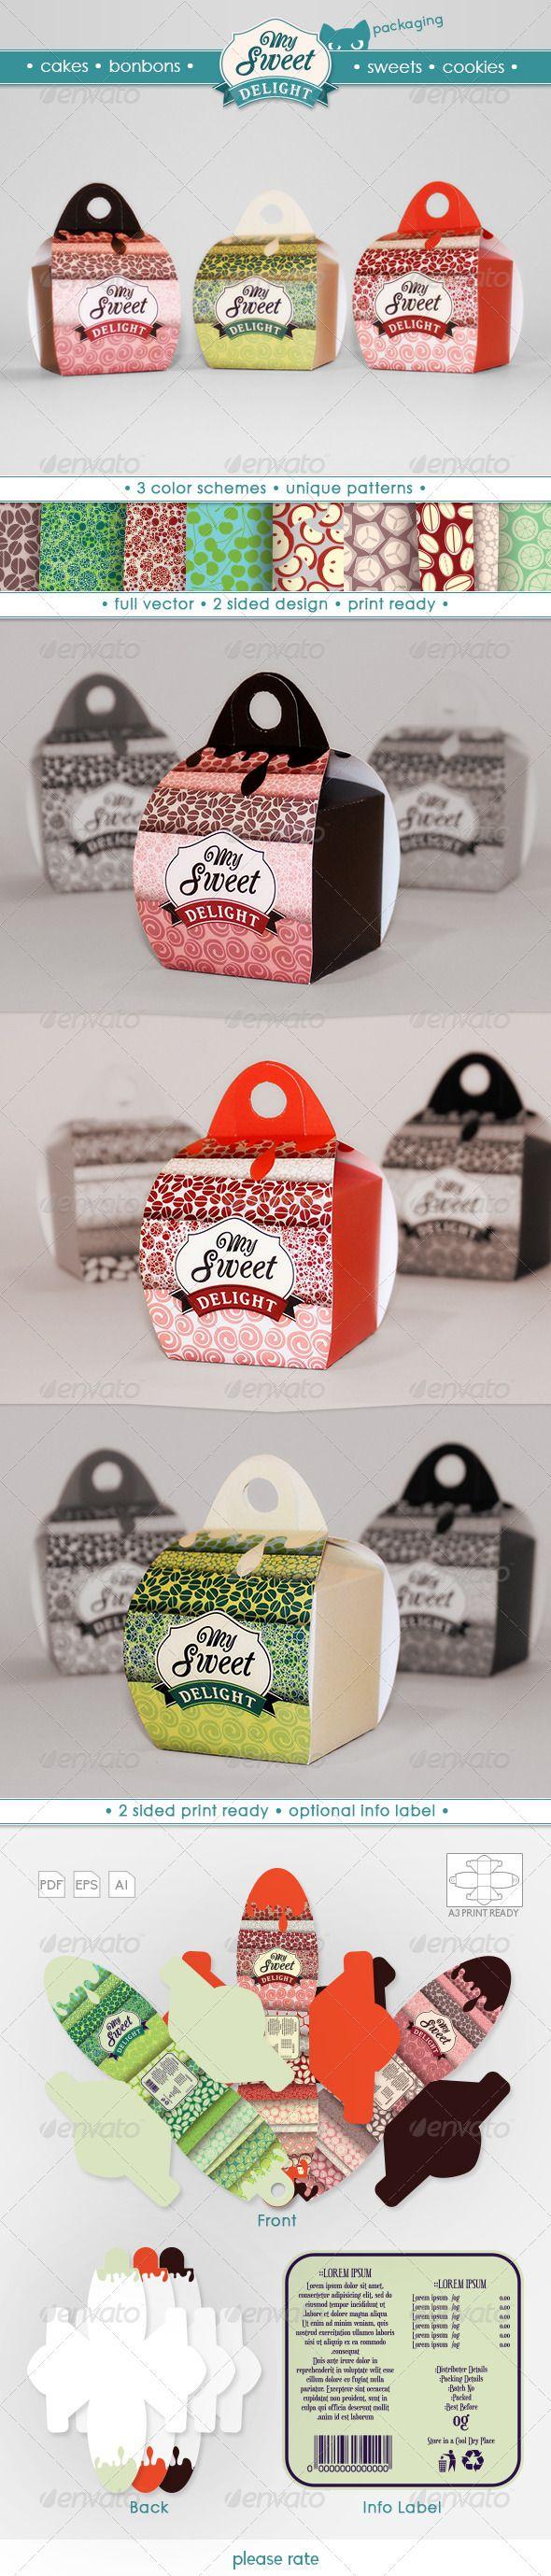 My Sweet Delight Box